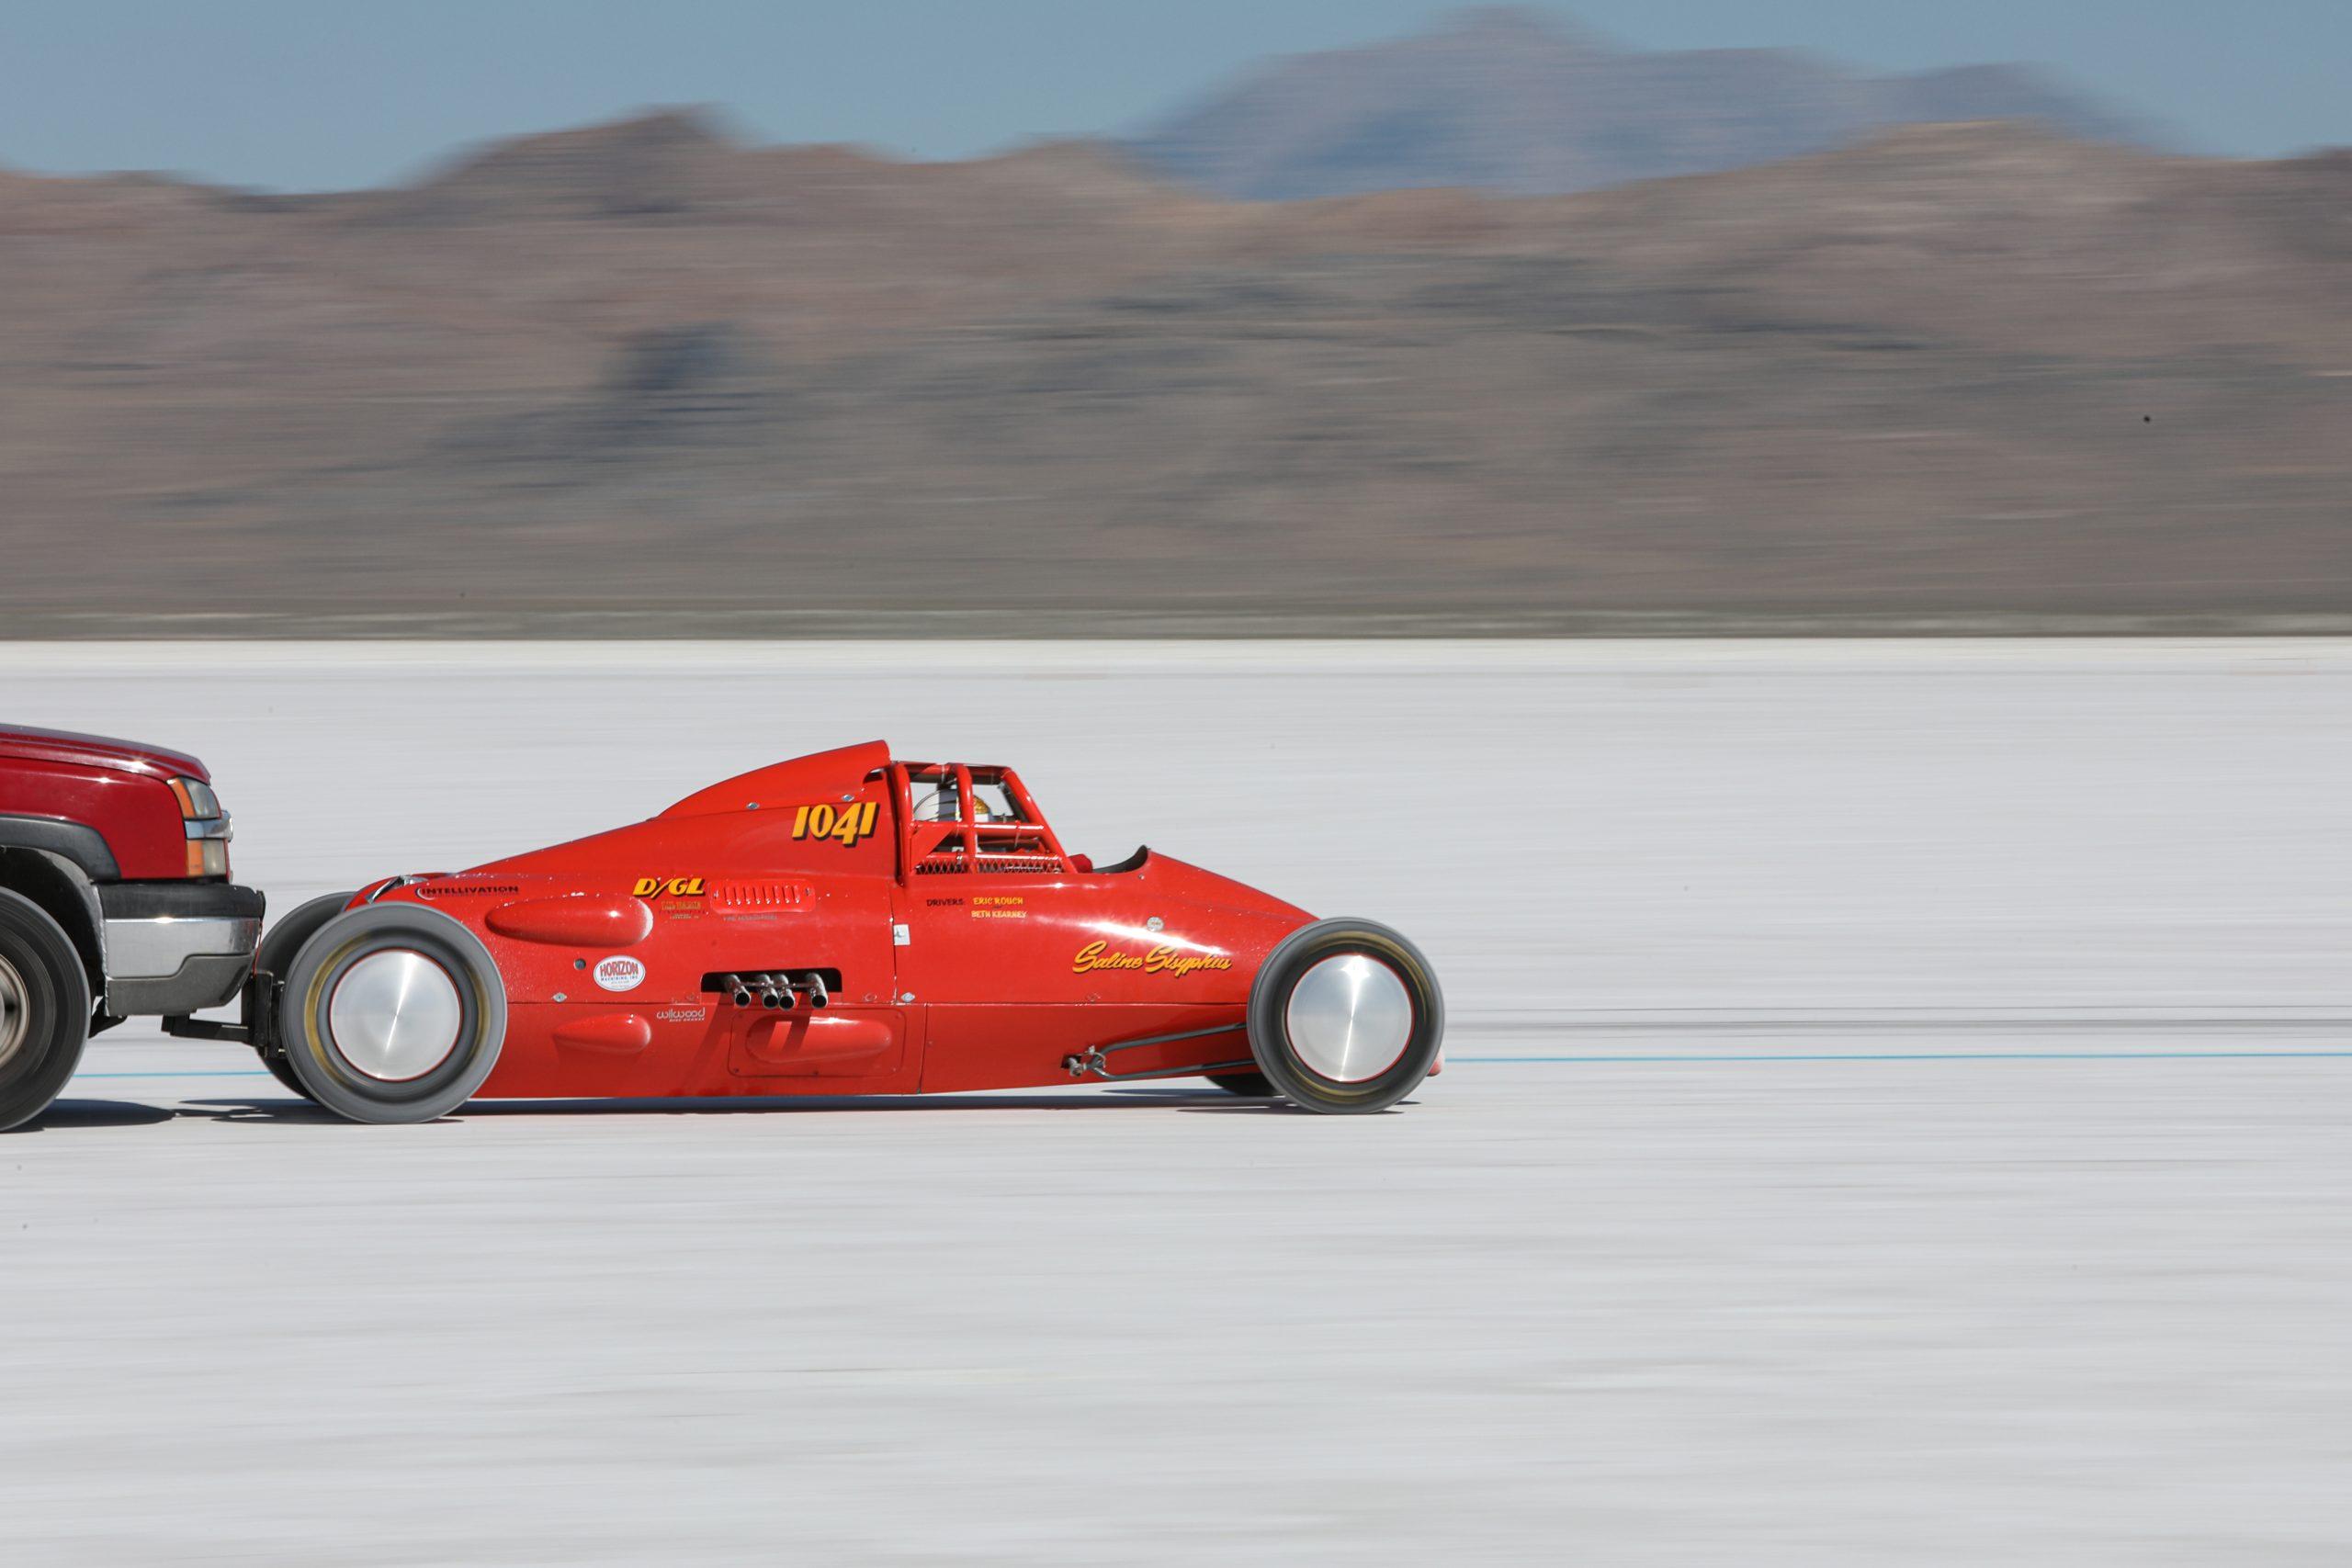 Bonneville Lakester 1041 Speed Week 2020